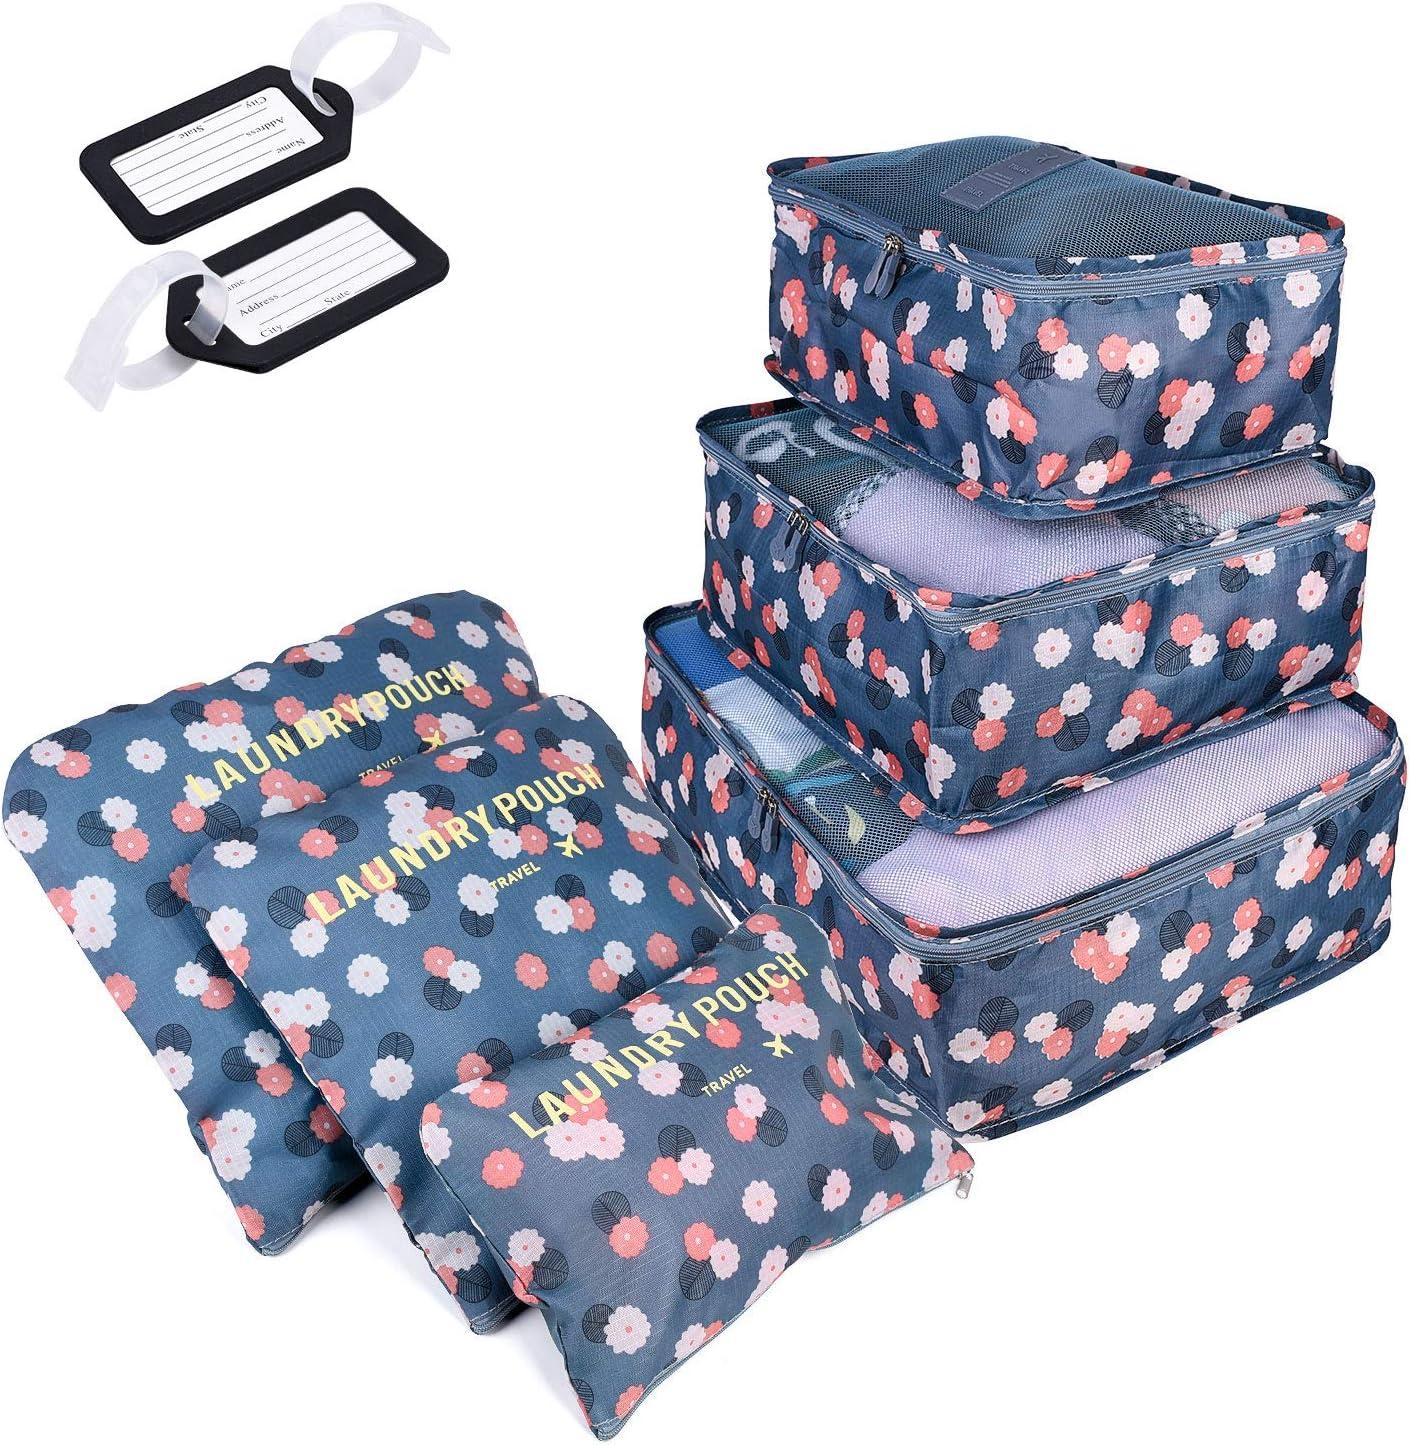 6 PCS Organizadores de Viaje para Maletas, Bolsas de Equipaje Impermeable Cubos Embalaje de Viaje Bolsas de Almacenamiento para Ropa Zapatos, Cosméticos Accesorios, Material Nylon (Azul Flor)